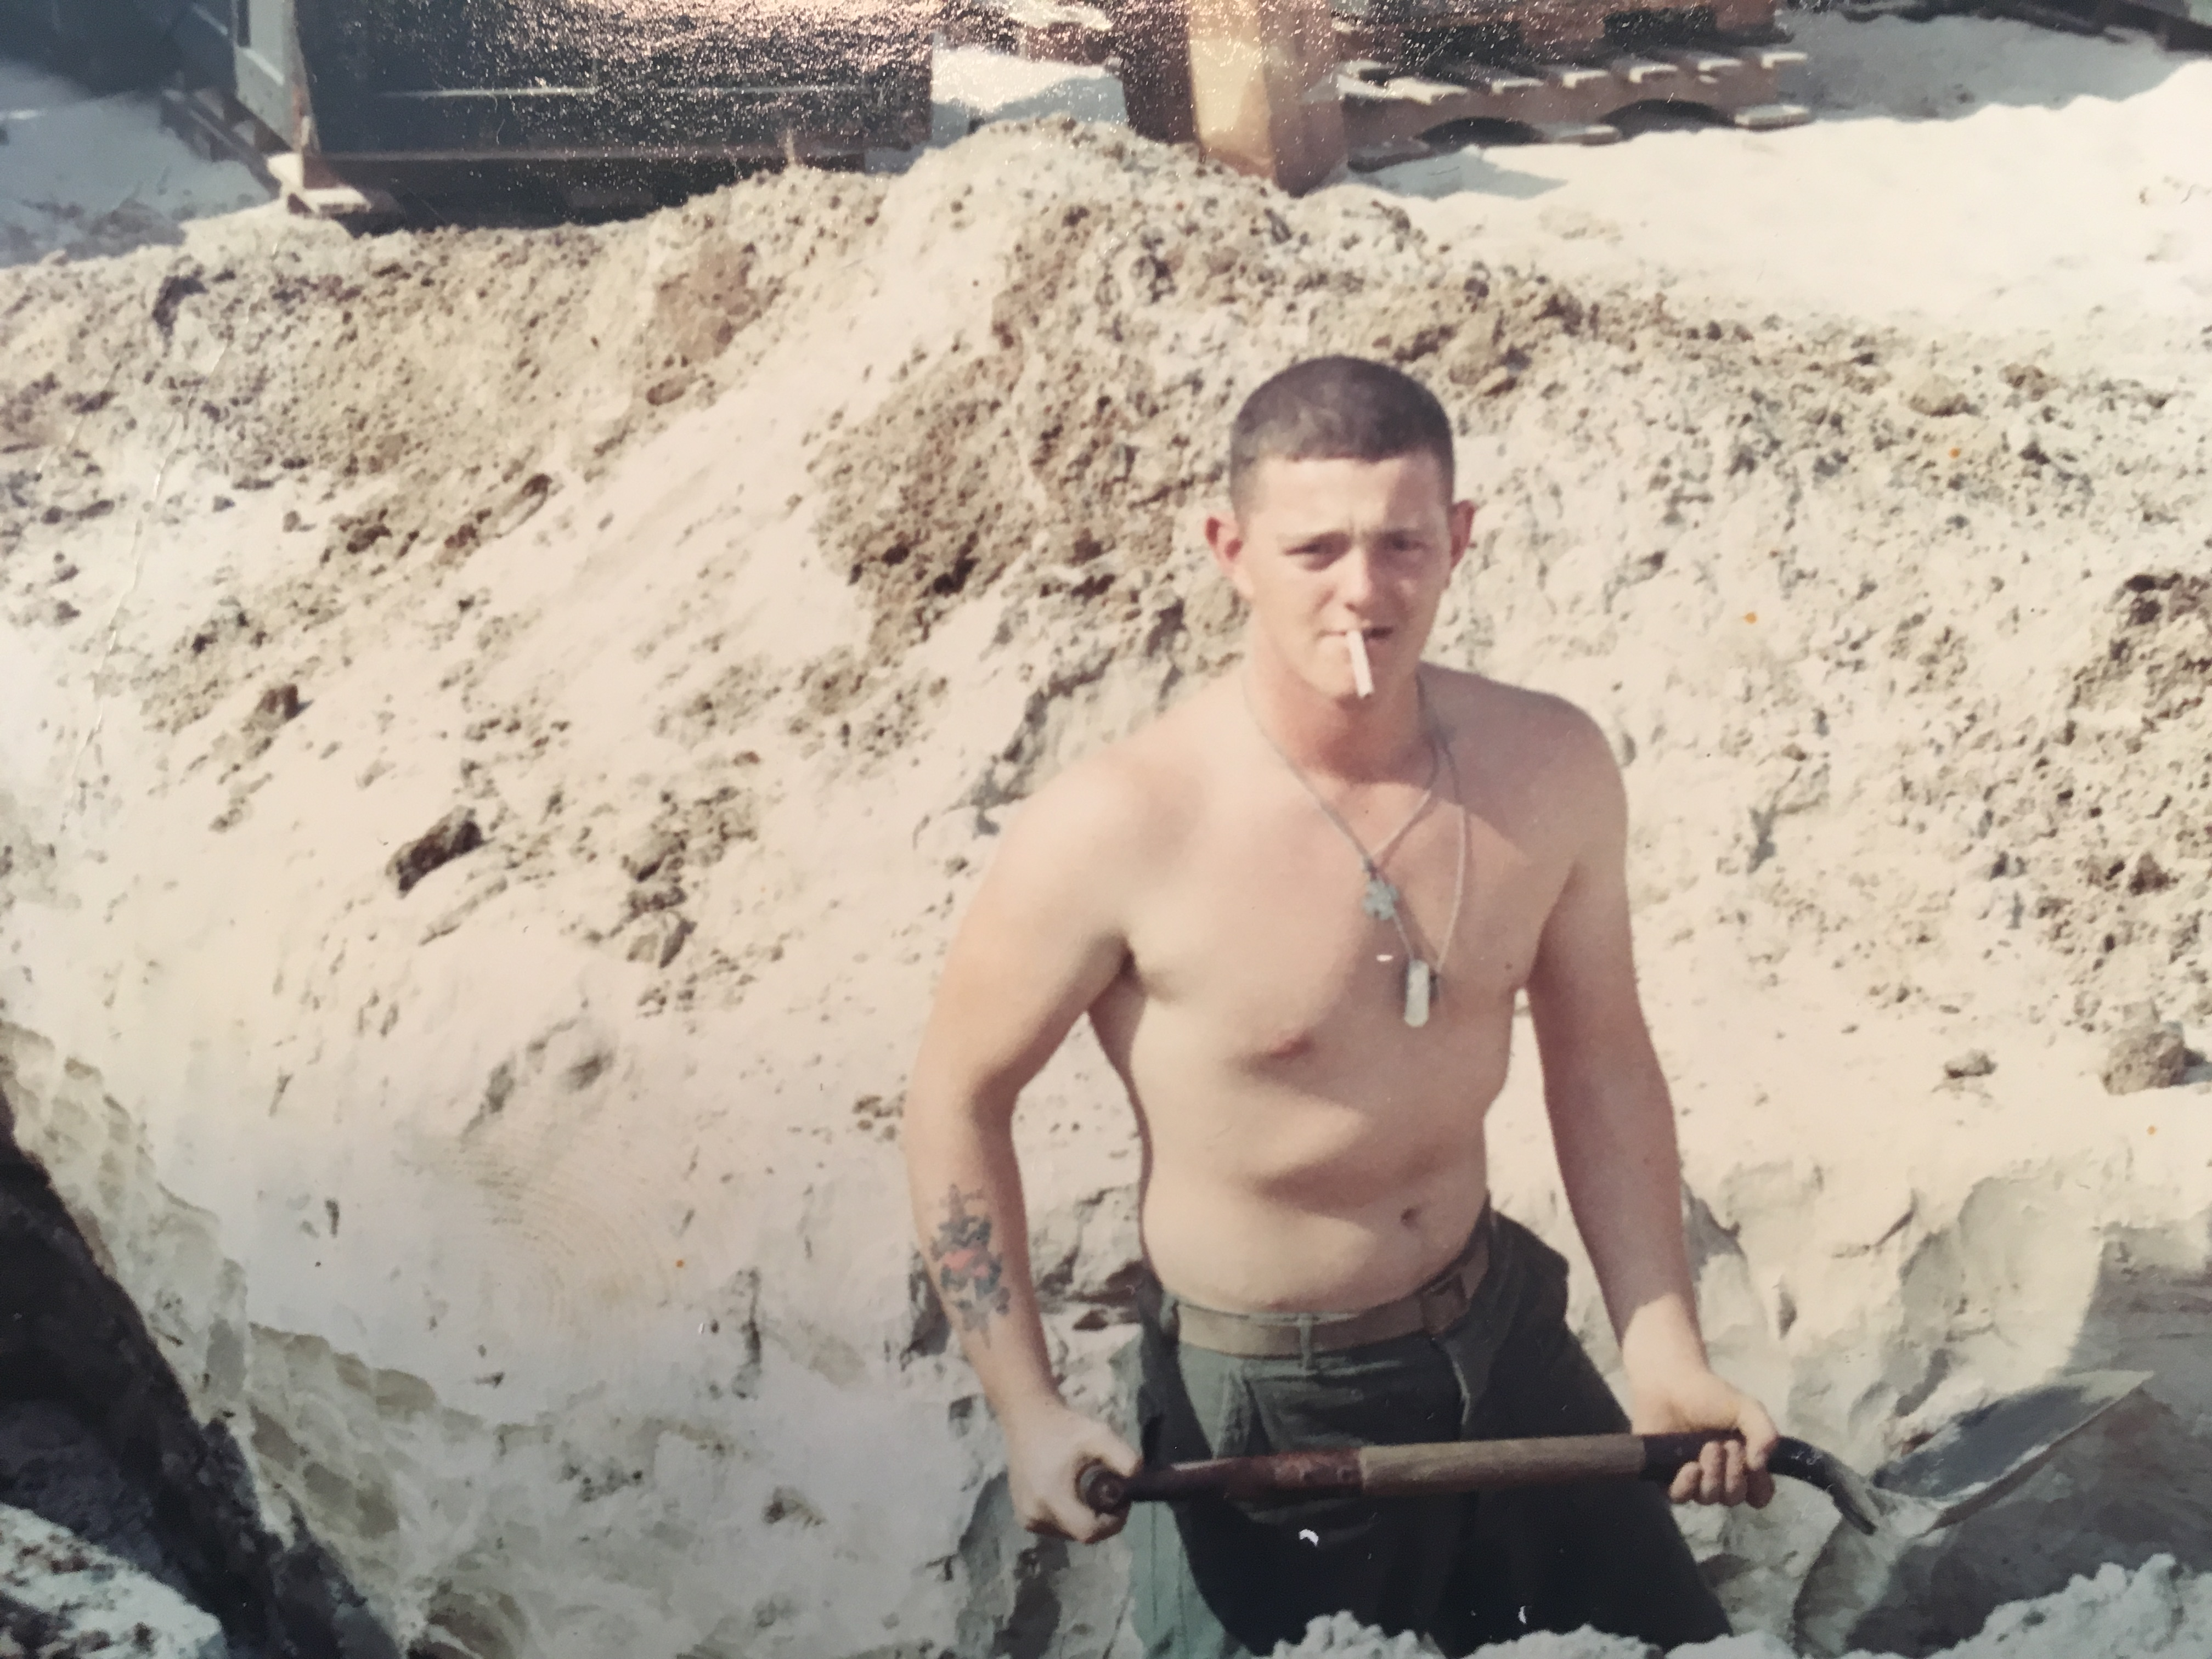 Bernie shovling sand in Vietnam